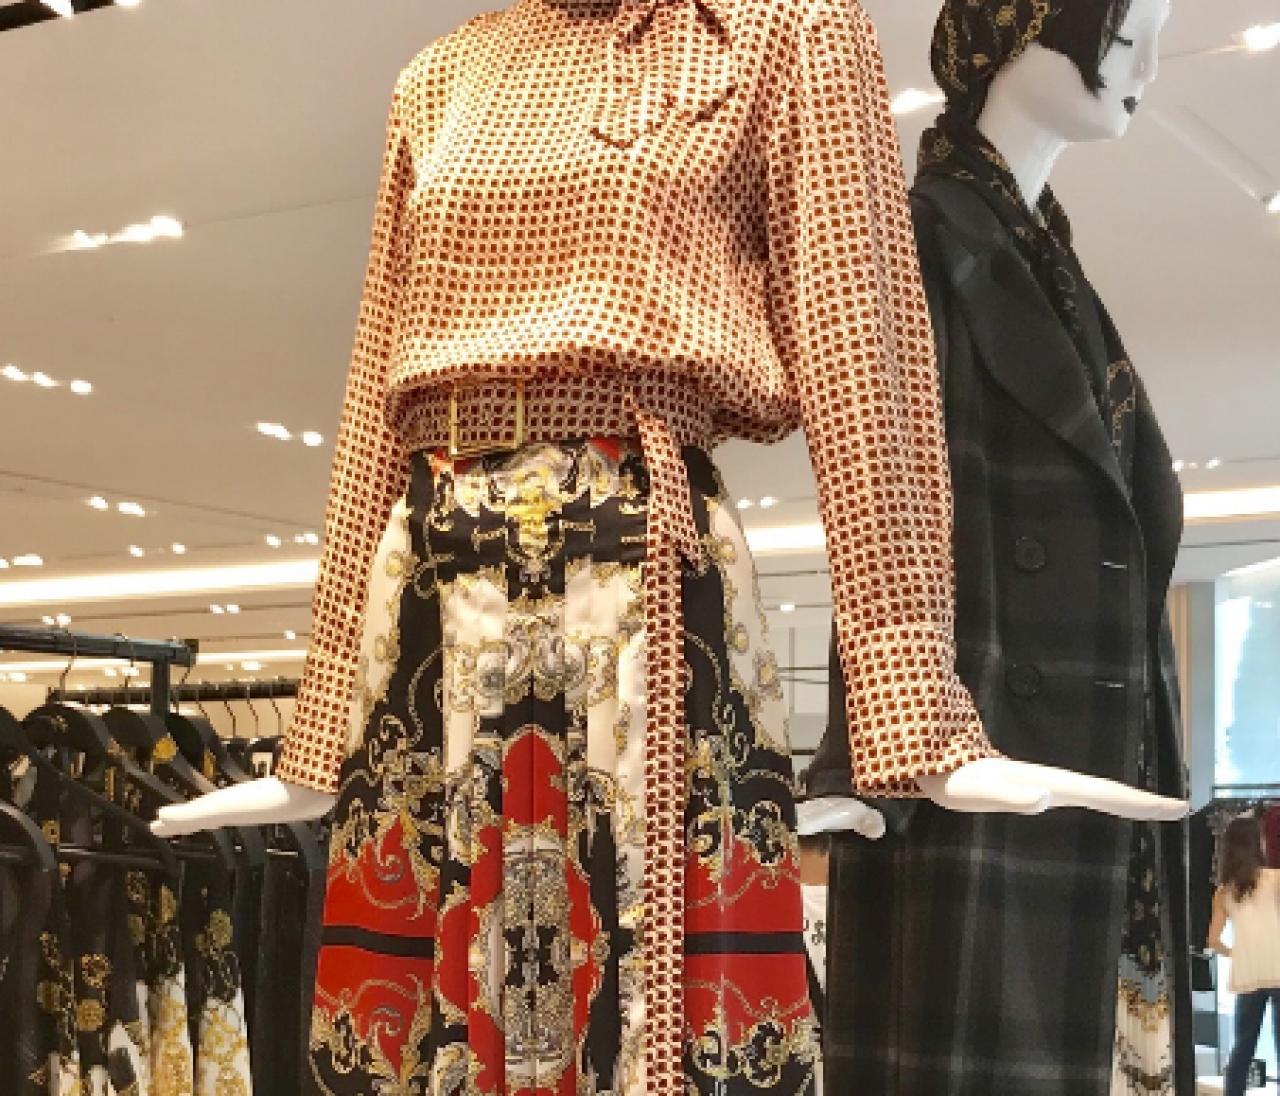 ZARAで探す秋の大人カジュアルコーデ16選【30代向けレディースファッション】